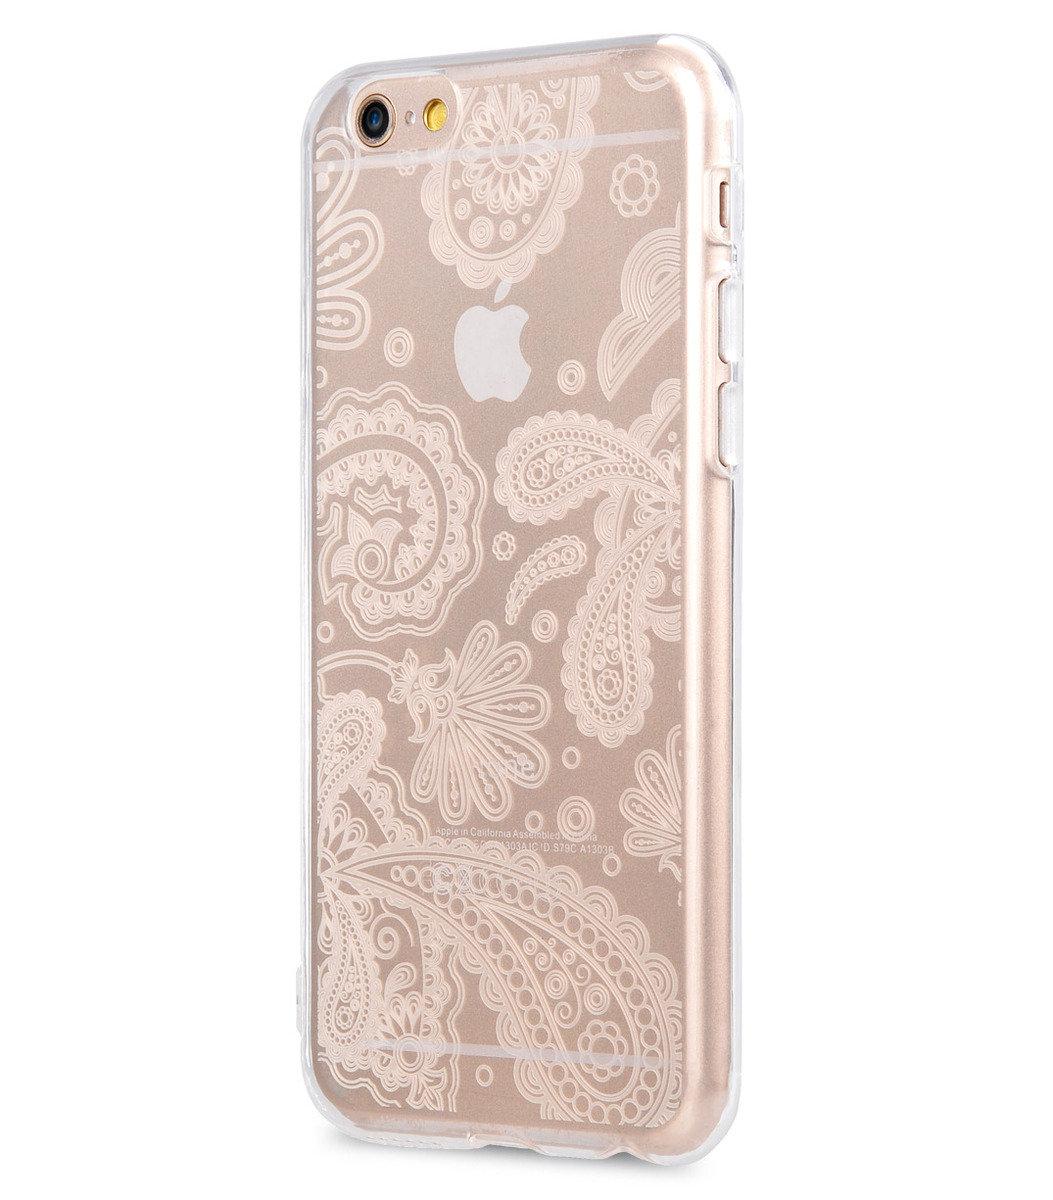 Nation TPU殼 IPhone 6S/ 6 - 4.7'' (透明變型蟲)